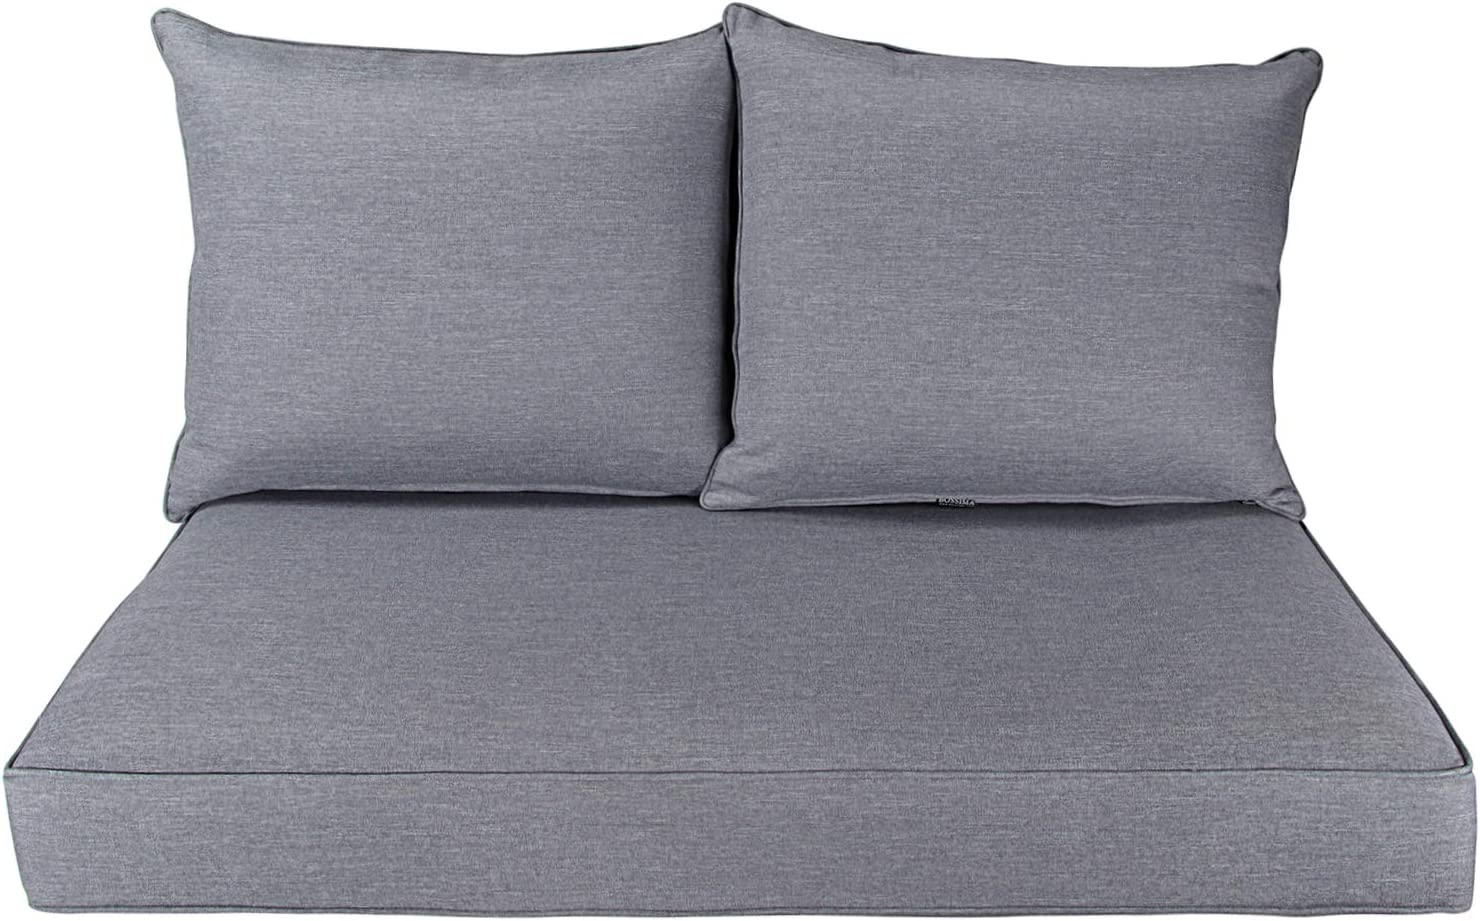 BOSSIMA Patio Furniture Cushions Comofort Deep Seat Loveseat Cushion Indoor Outdoor Seating Cushions Light Grey